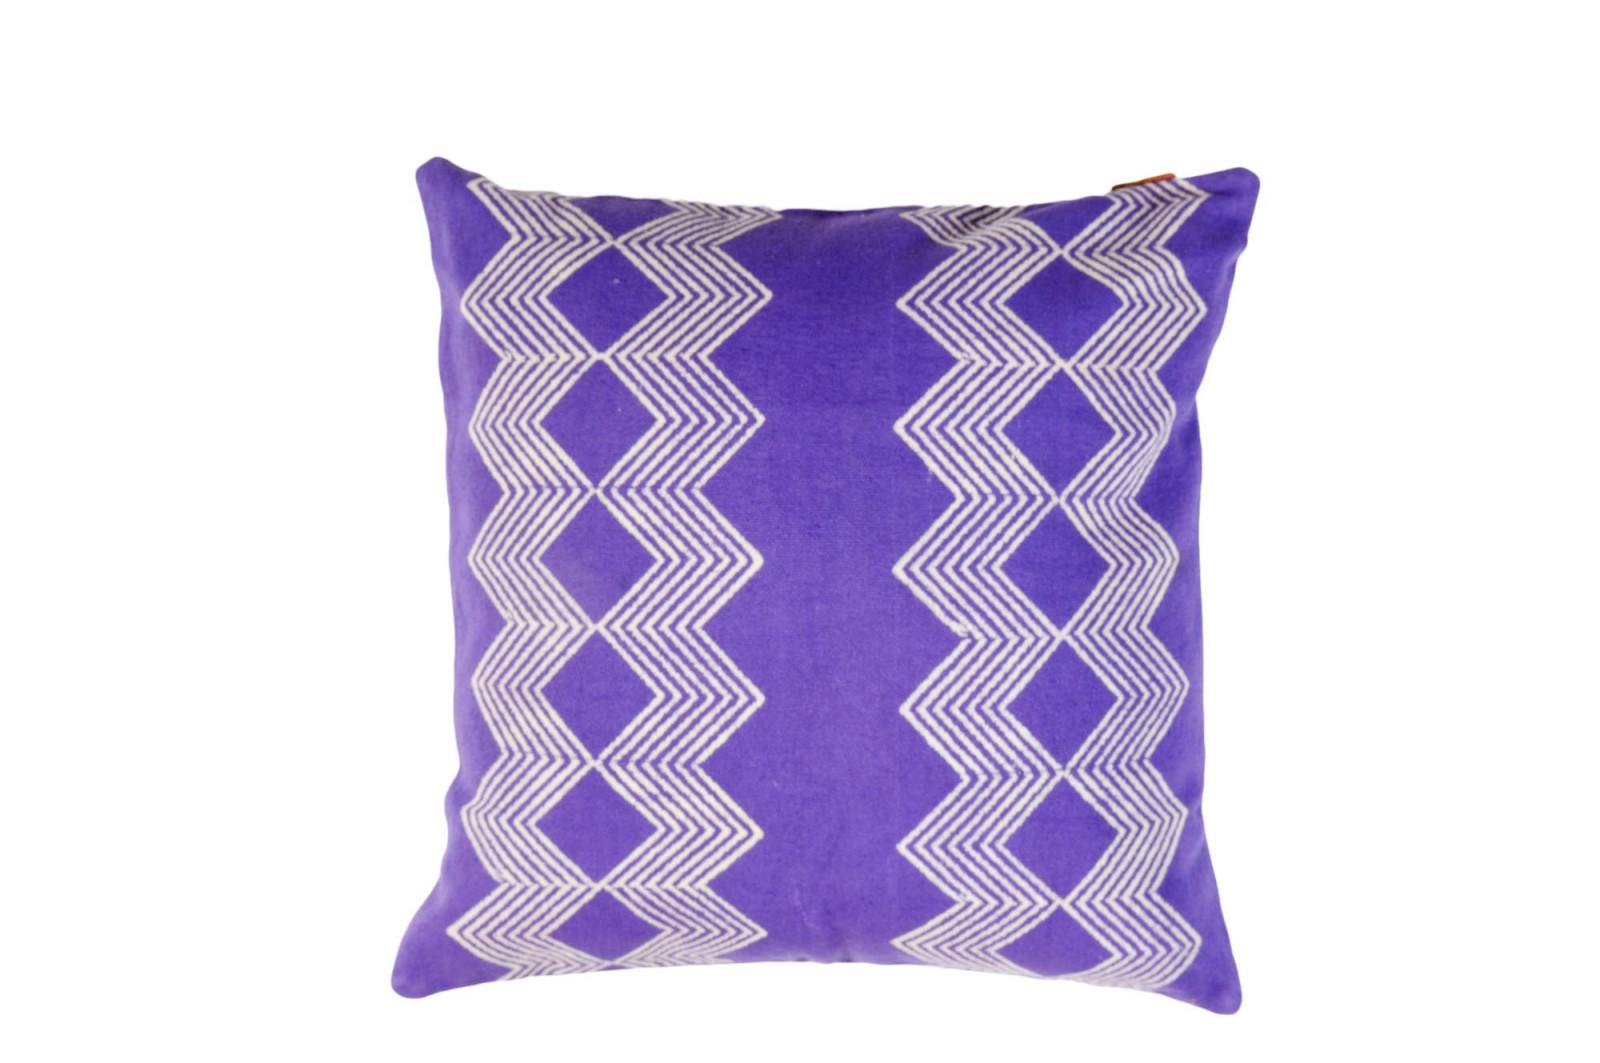 COUSSIN 50x50 CHANDIGARH / violet bleu